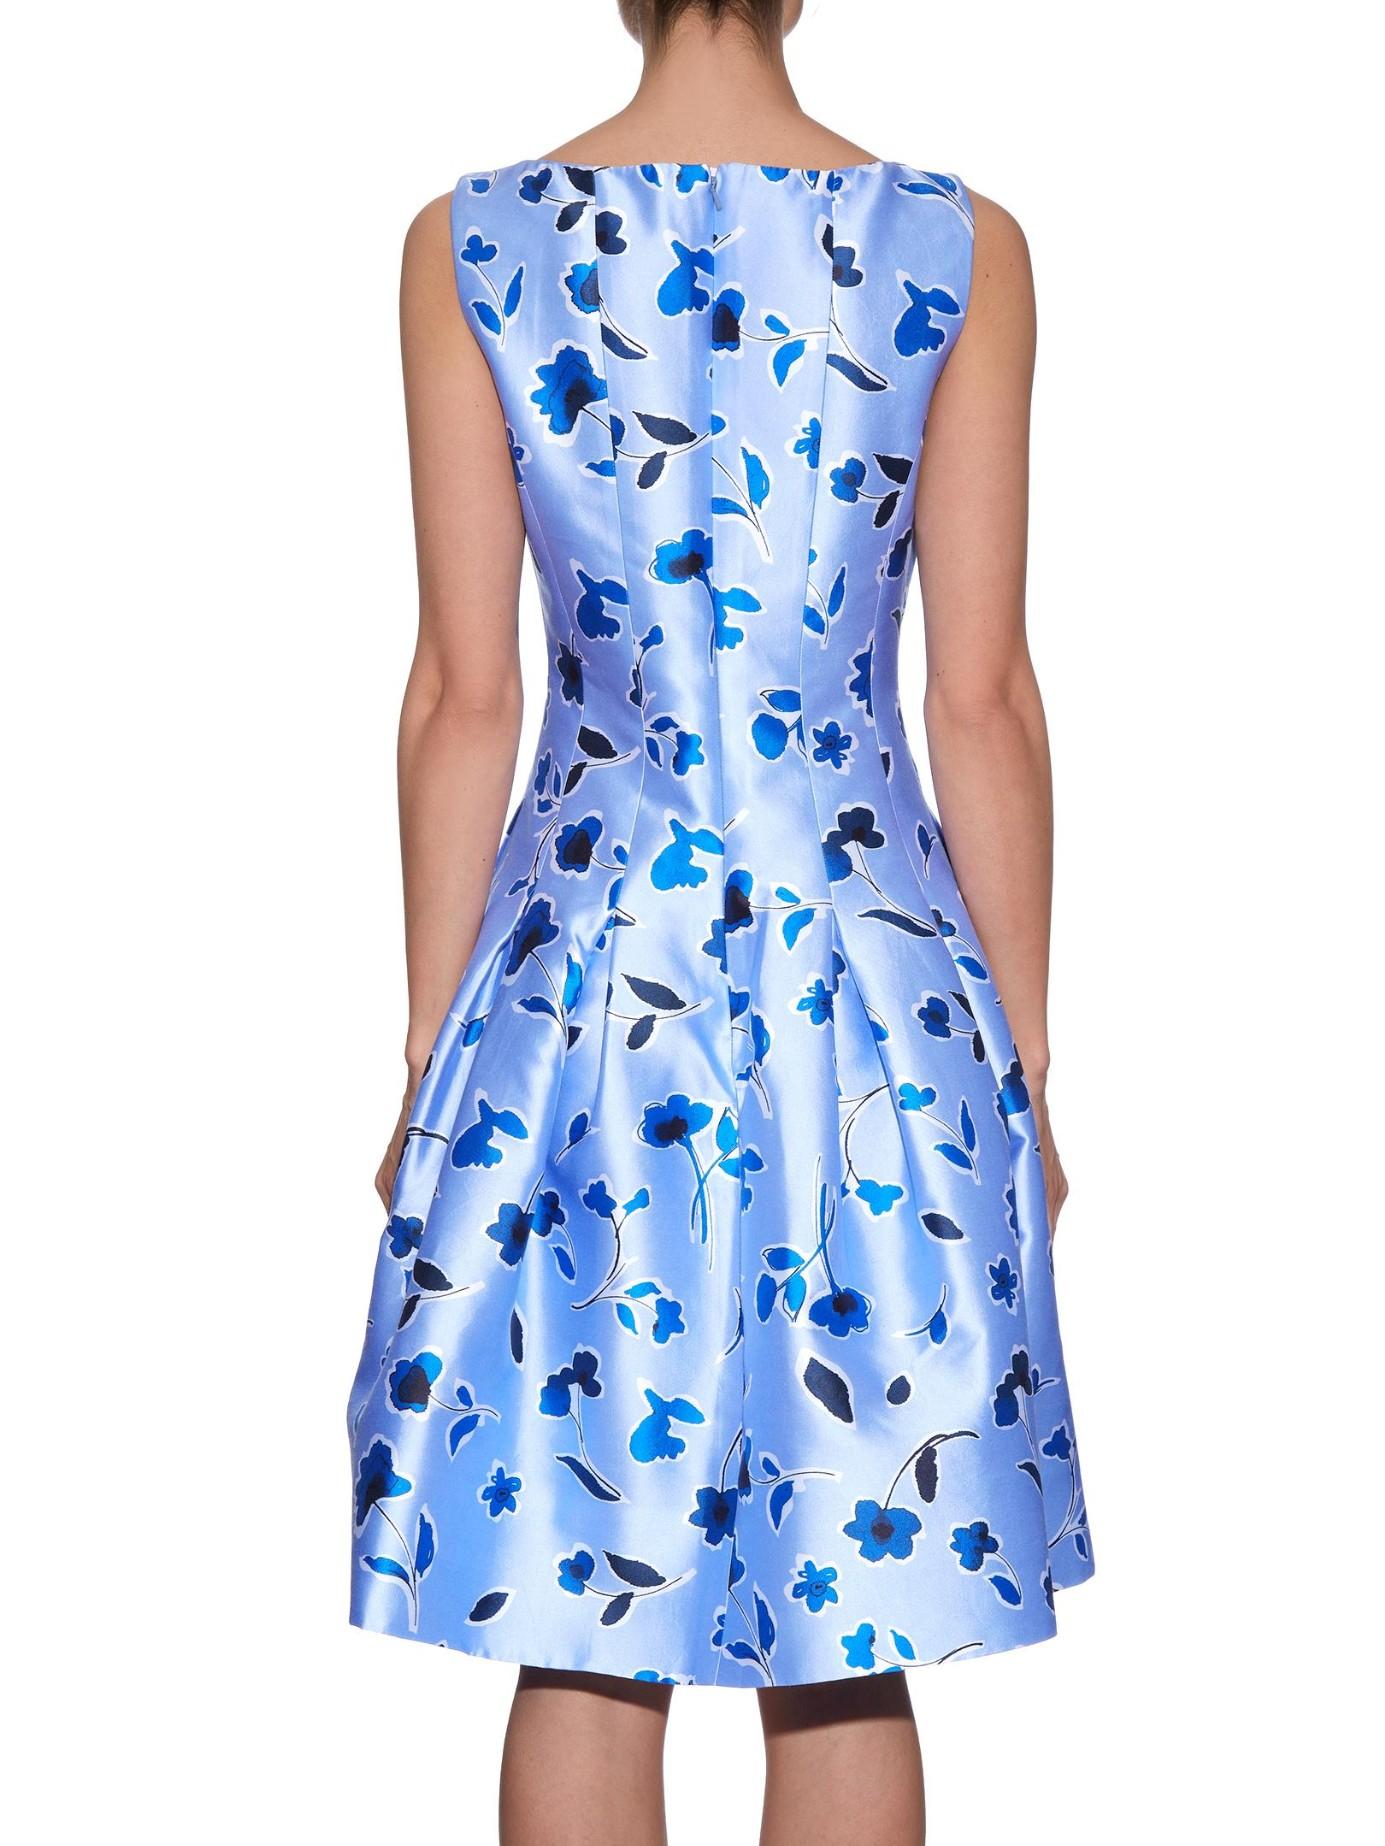 0b692688f6 Oscar de la Renta Pleated Printed Silk And Cotton-blend Dress in ...